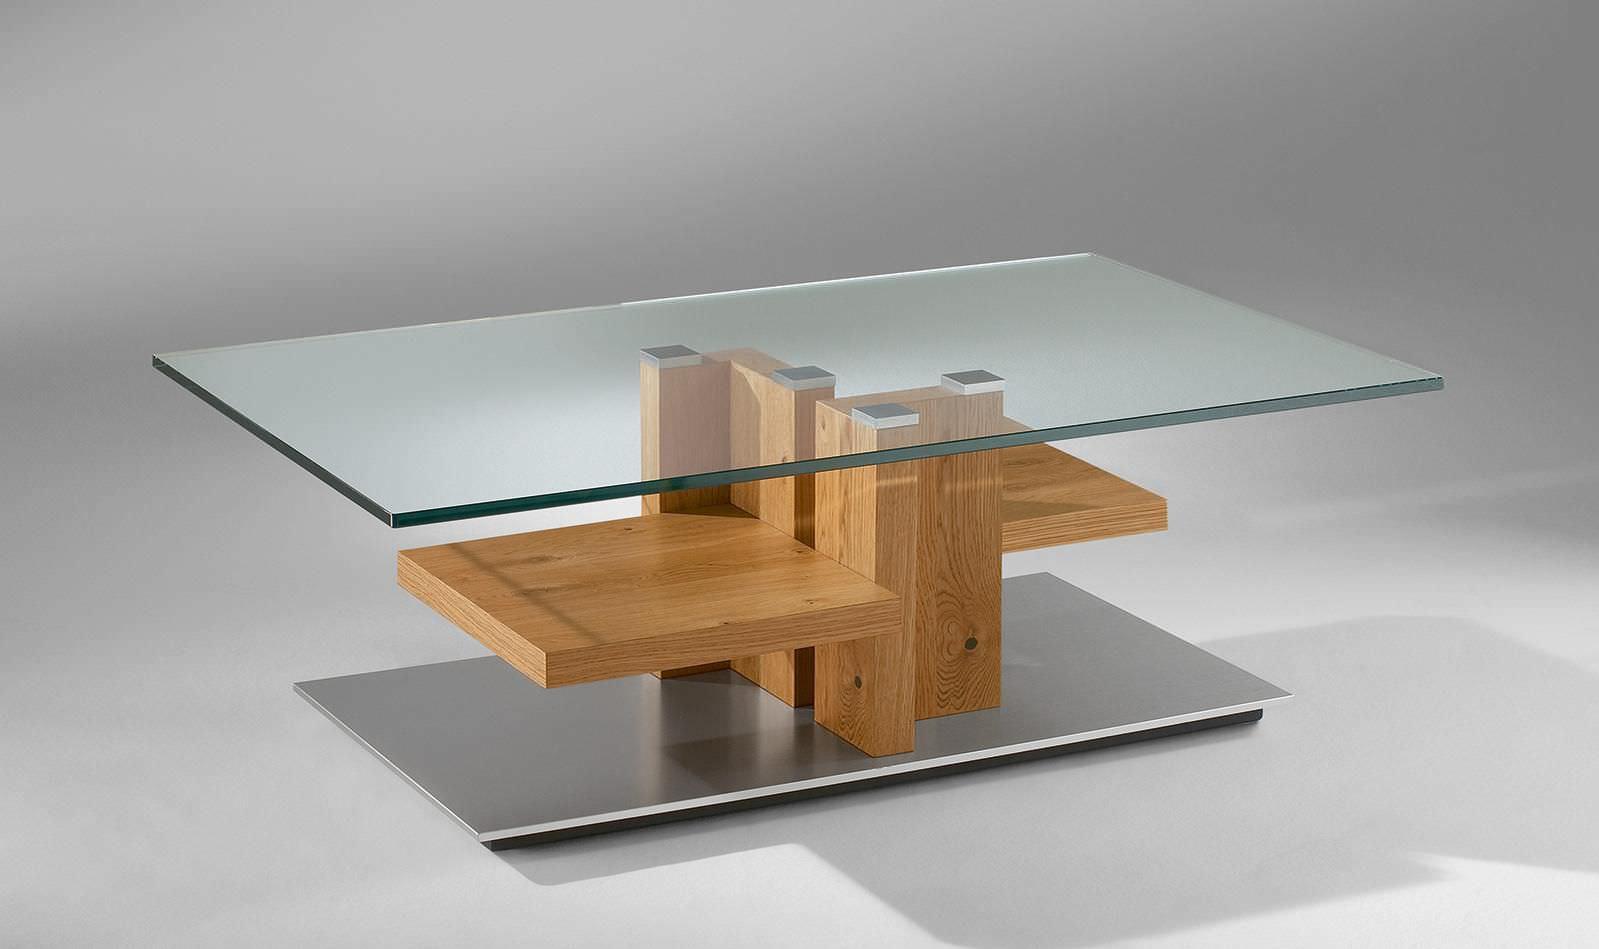 Moderner Couchtisch / Holz / Glas / rechteckig - 4424 - Alfons ...